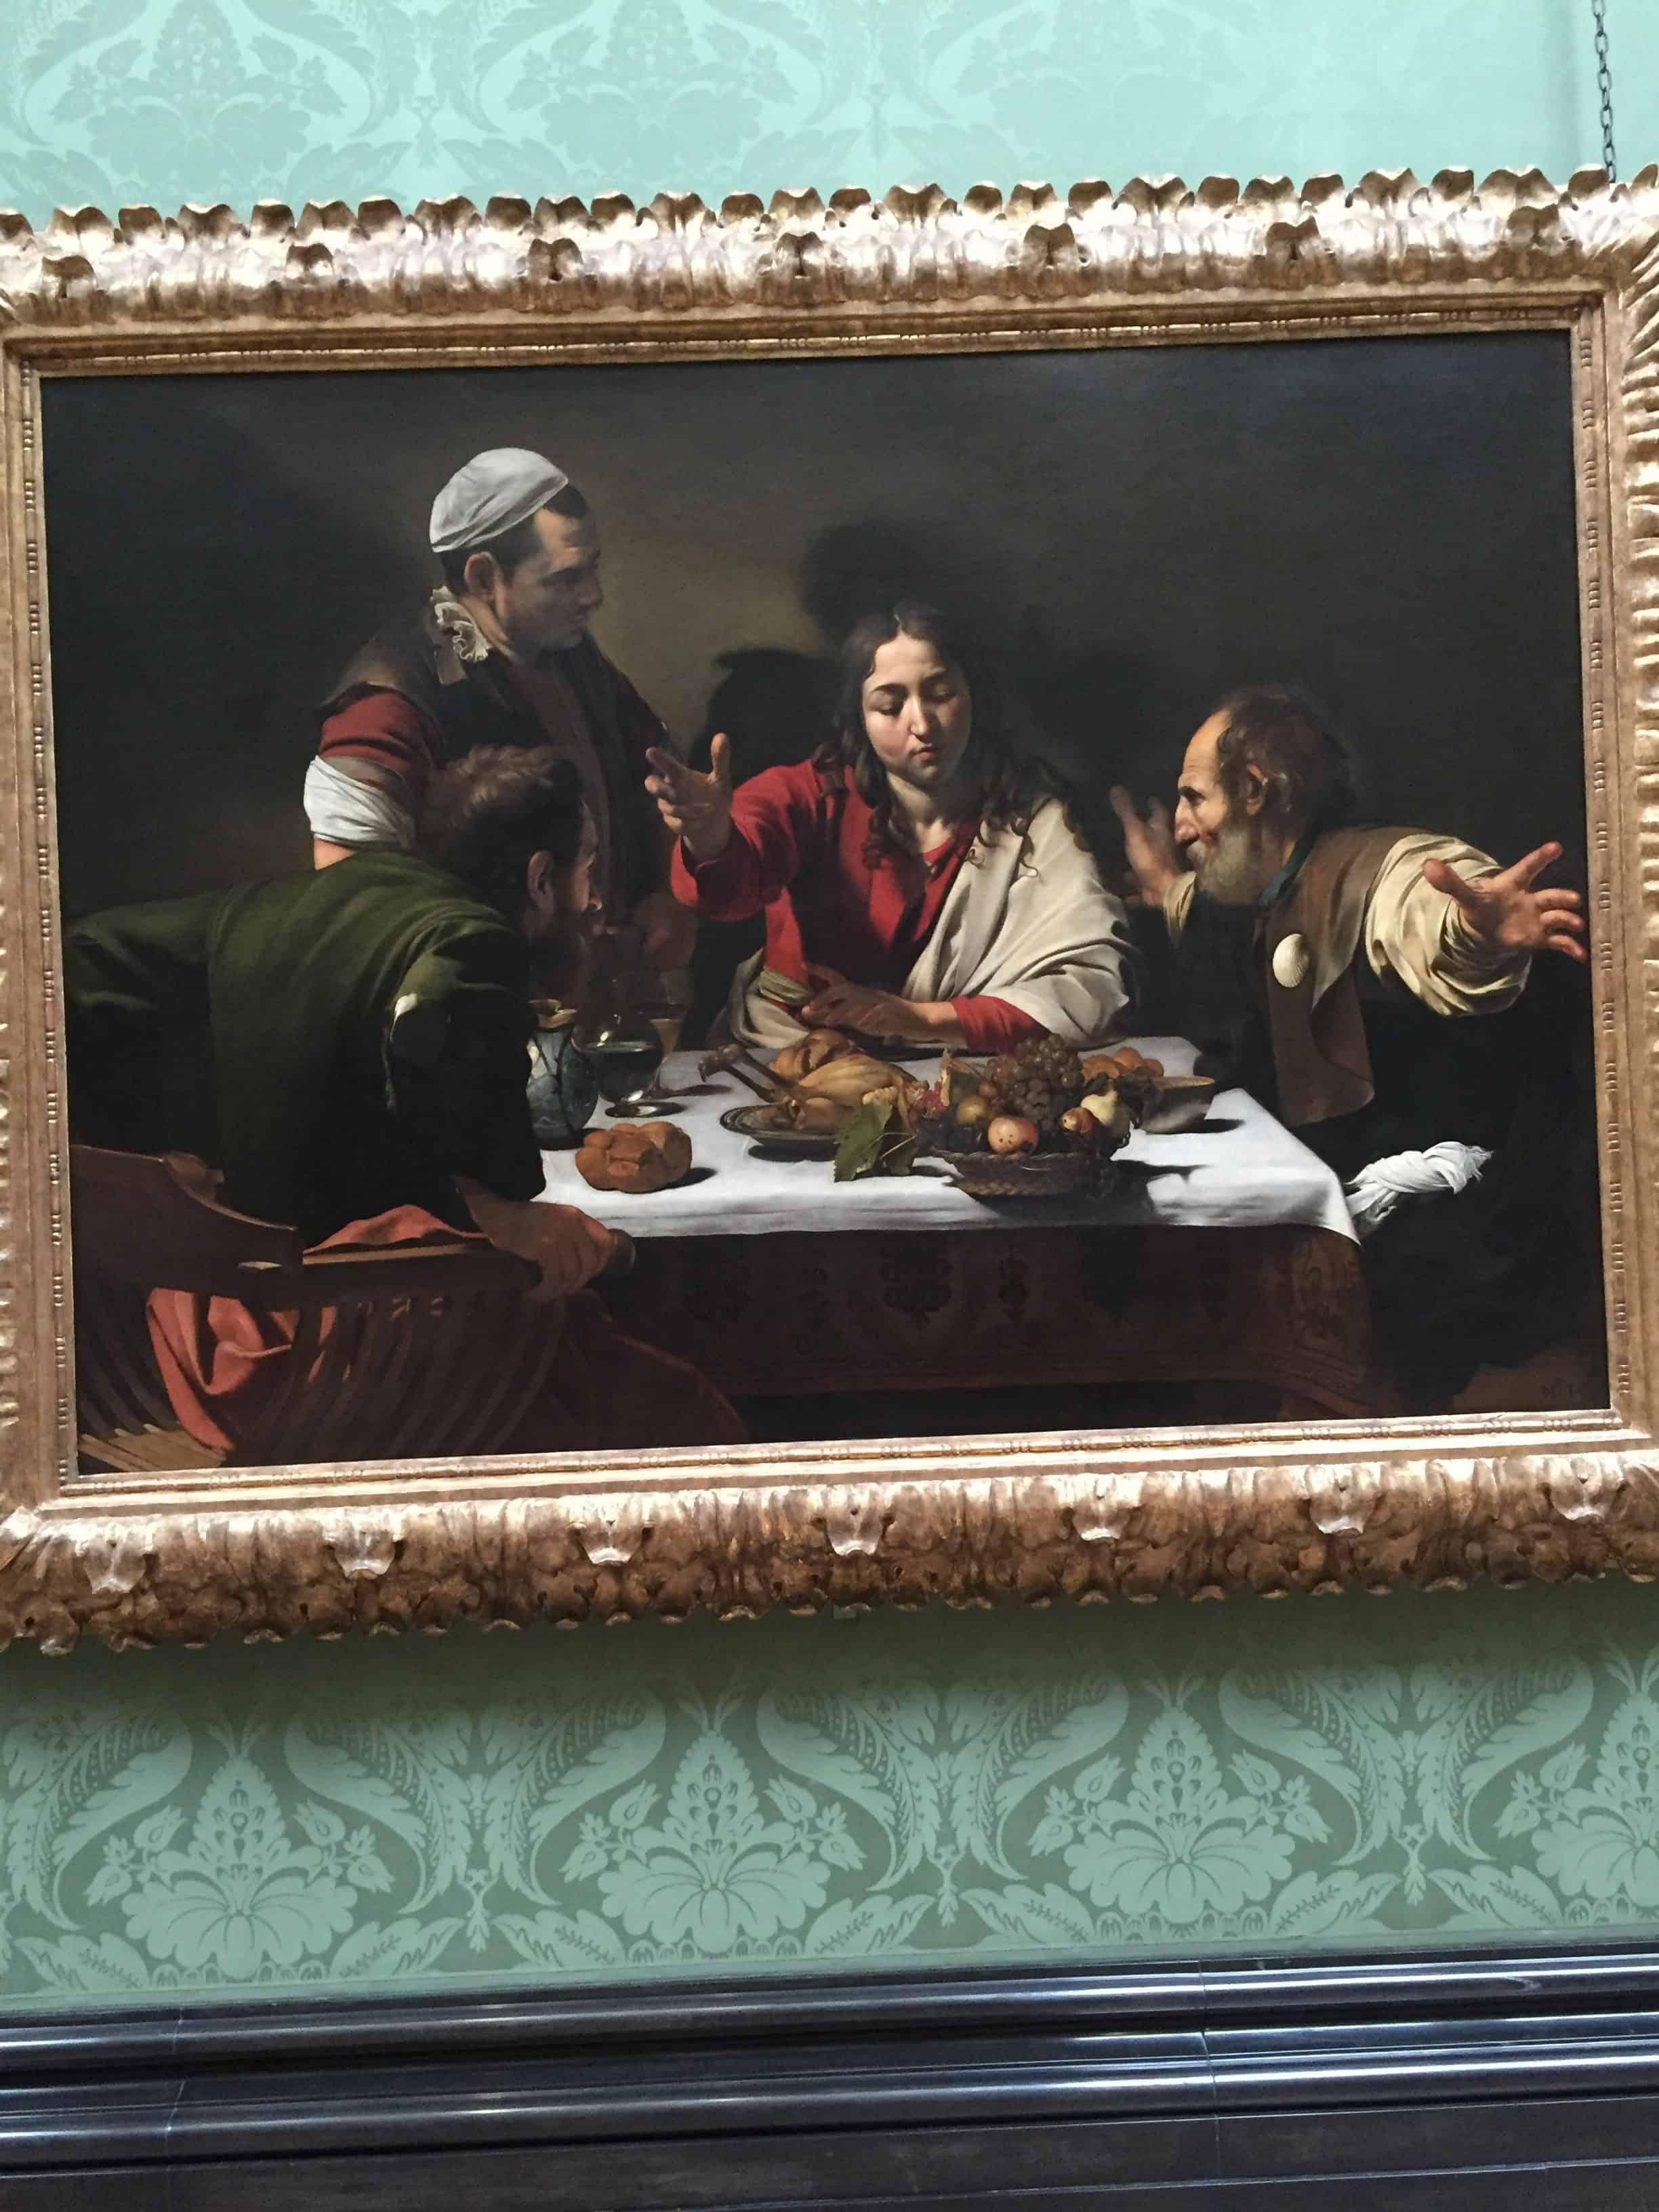 Quadro na Galeria Nacional